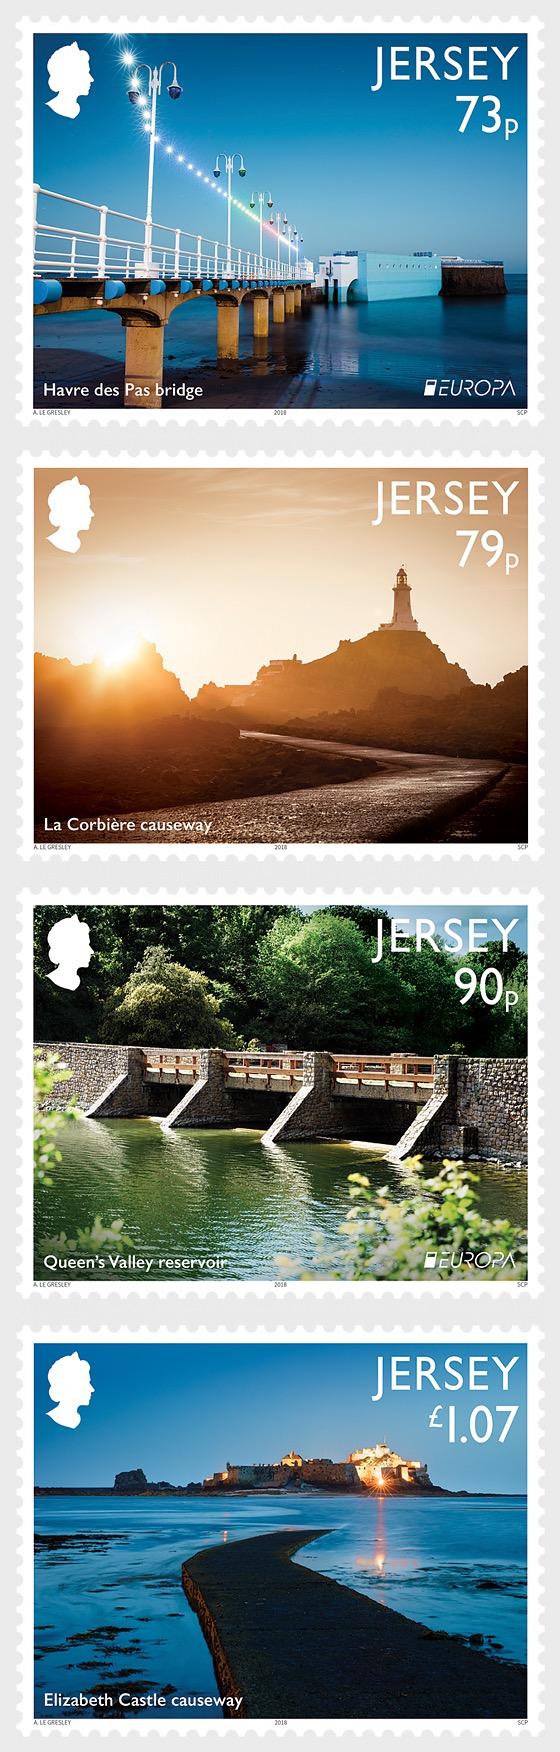 Europa 2018 - Jersey Bridges & Causeways - Set